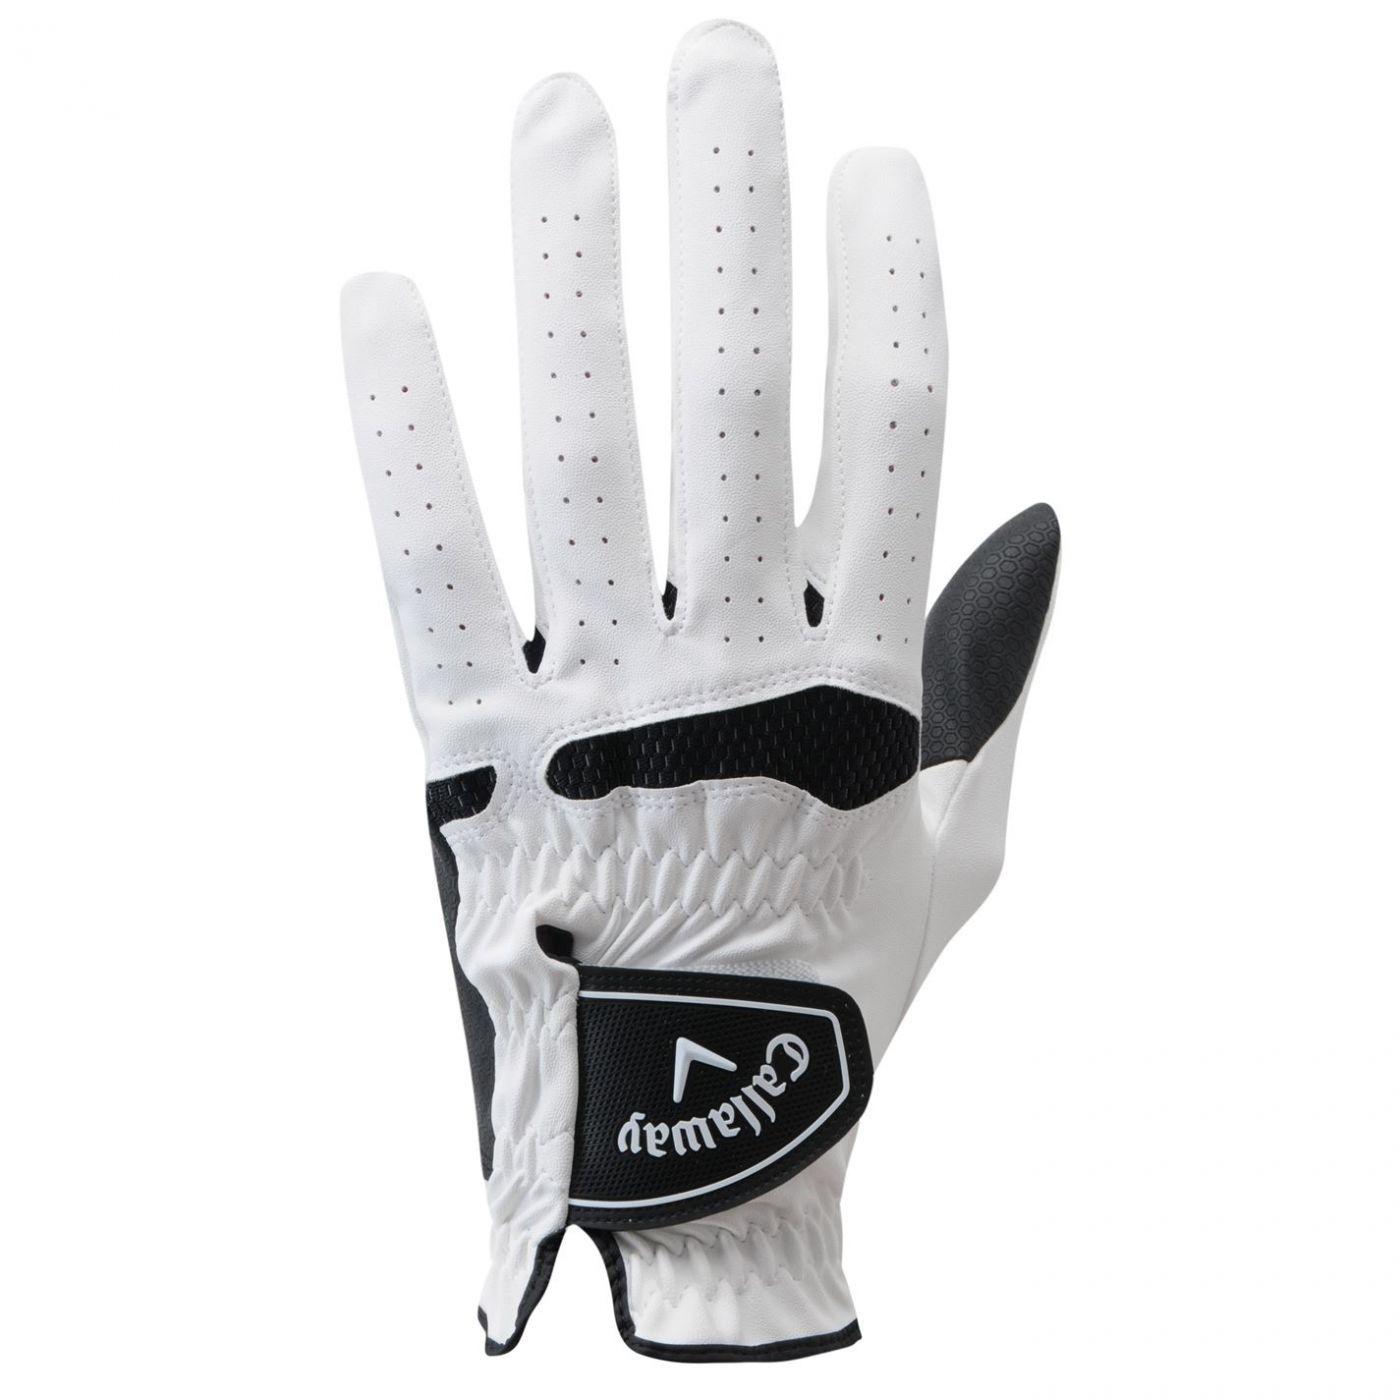 Callaway Xtreme Golf Glove